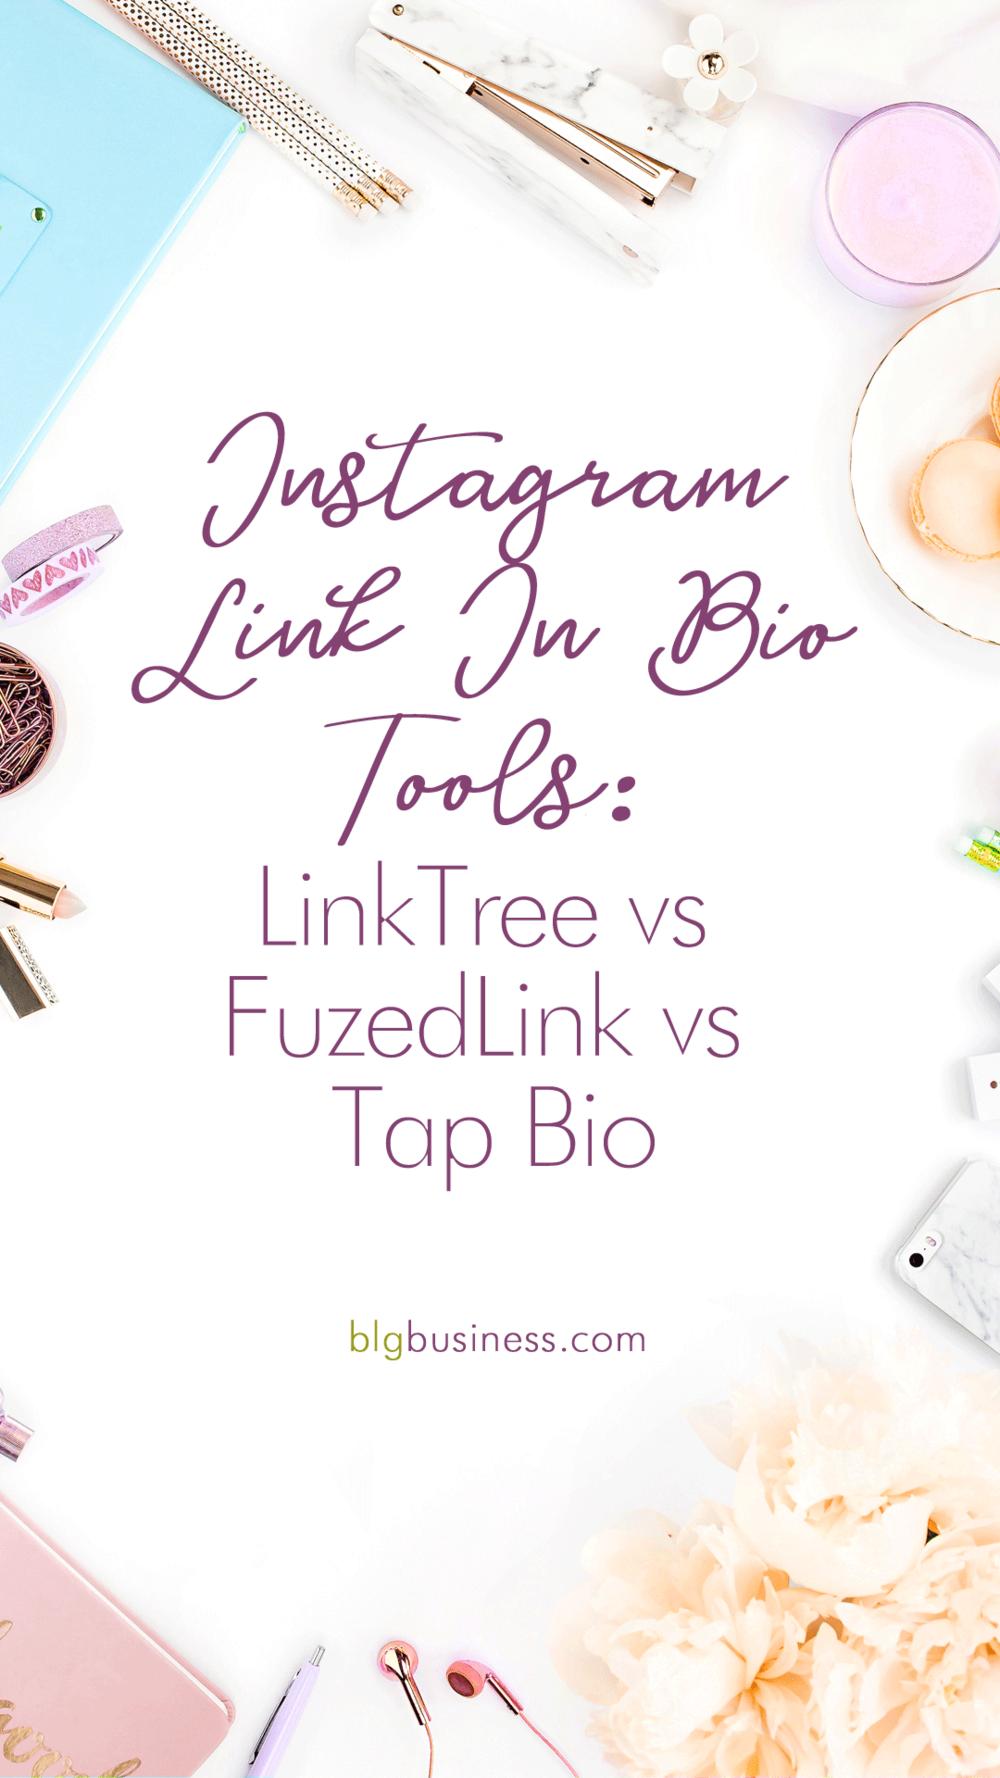 Instagram Link In Bio Tools: LinkTree vs FuzedLink vs TapBio